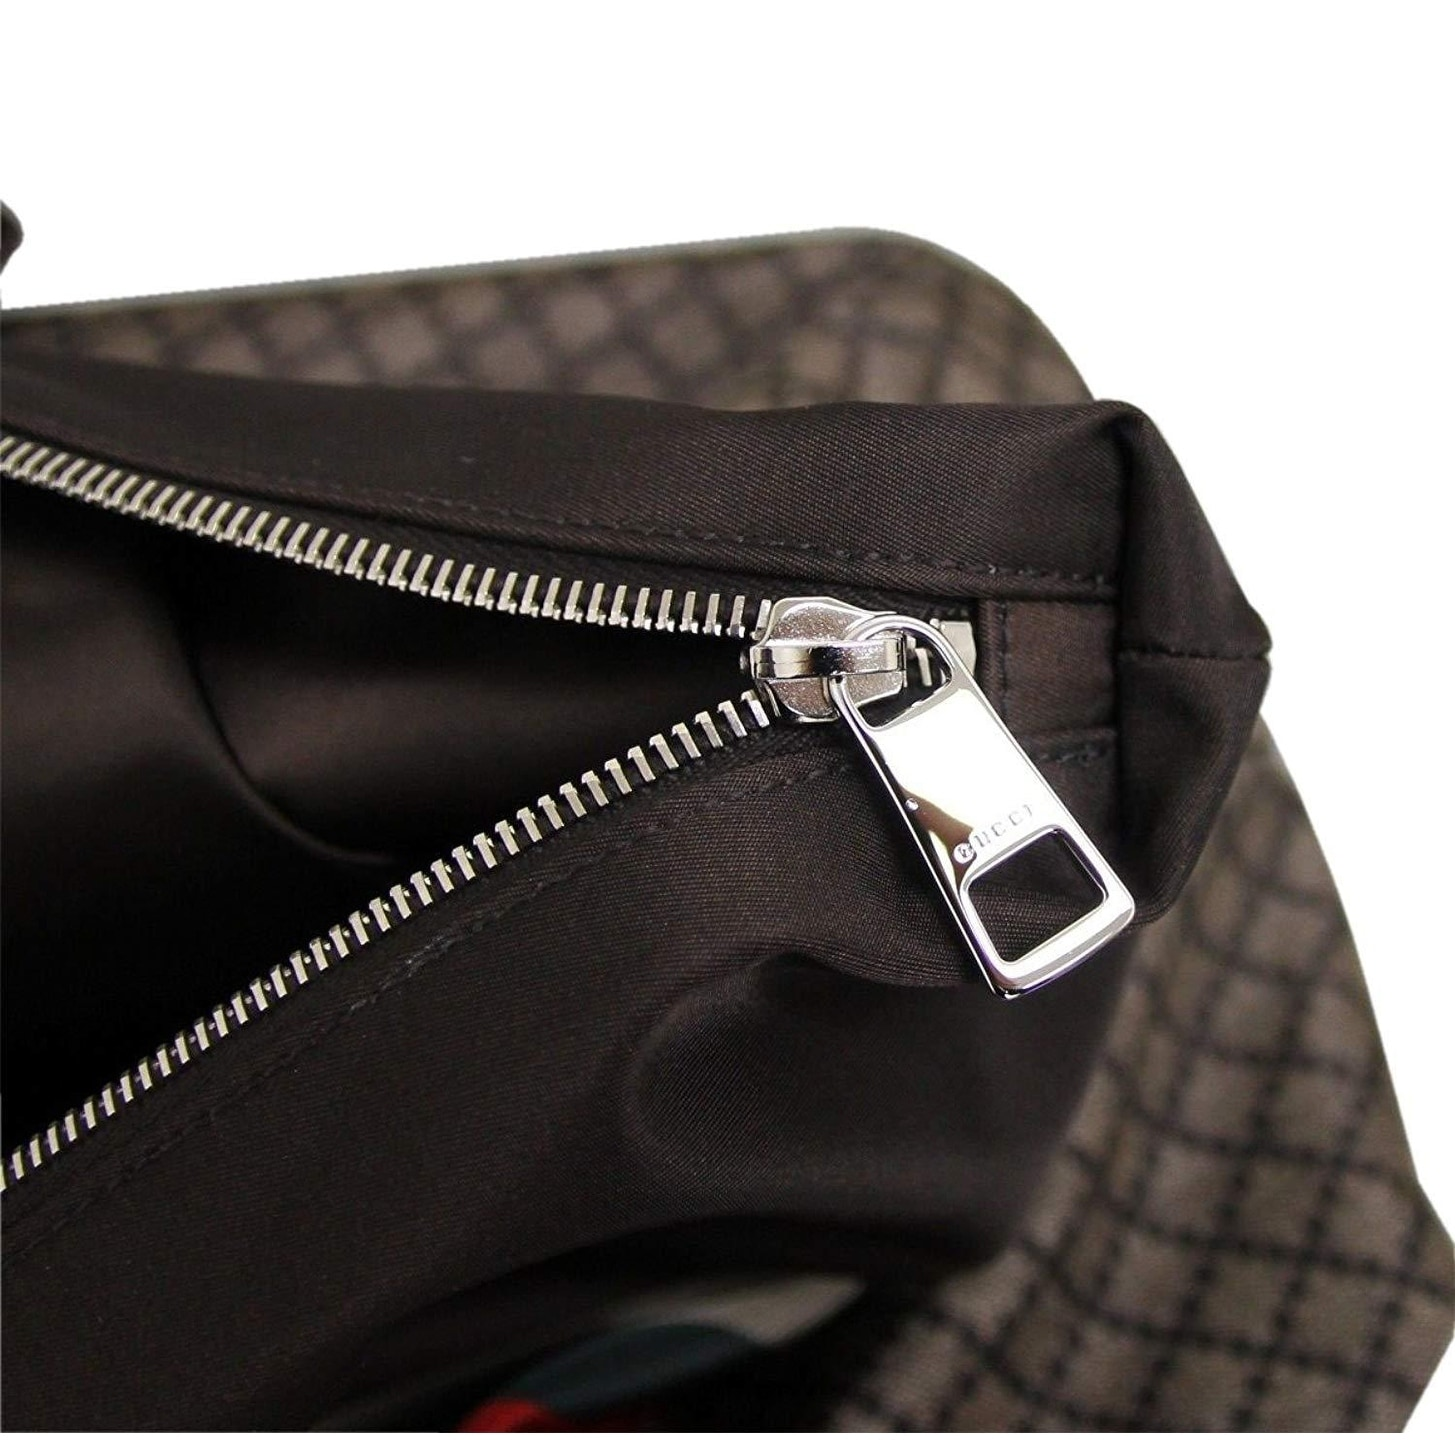 90217b7c4e5814 Shop Gucci Unisex Brown Nylon Diamante Tote Travel Bag 268106 8636 (XL) -  XL - Free Shipping Today - Overstock - 27603087